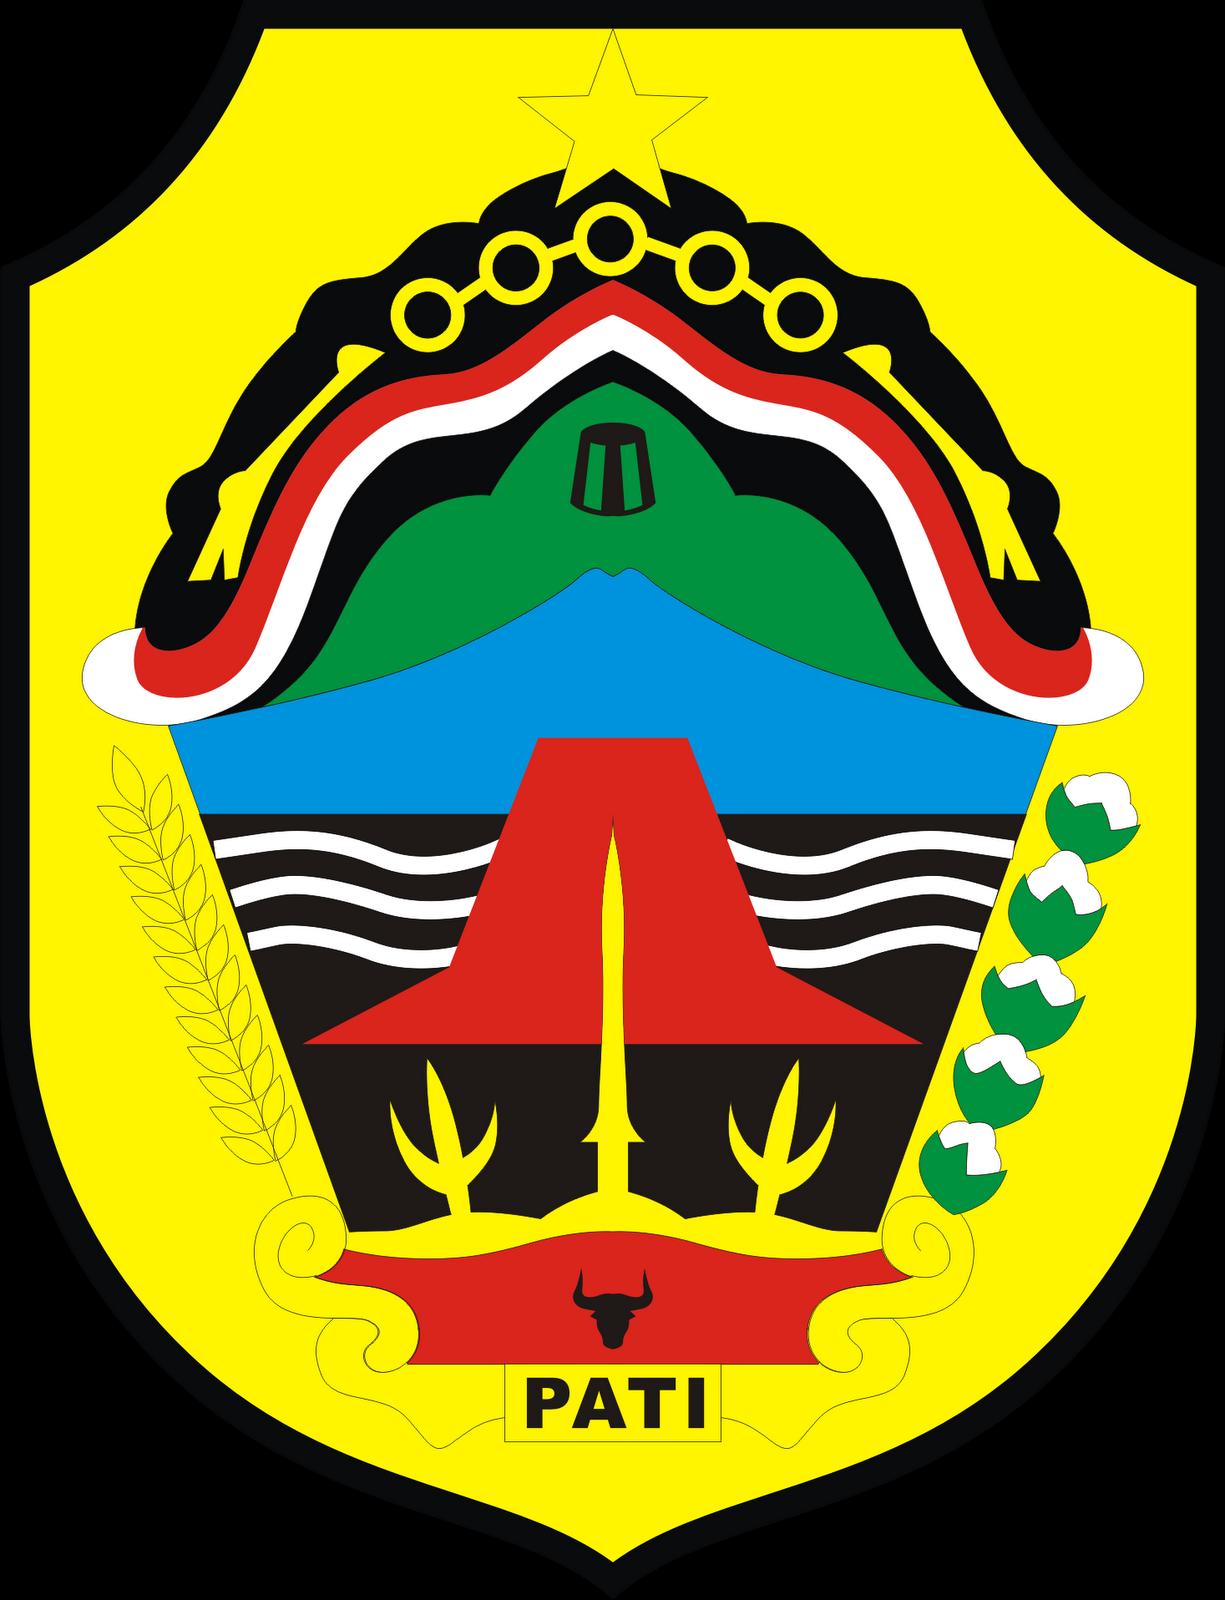 Pati Indonesia  City new picture : logo kabupaten pati profil nama resmi kabupaten pati ibukota pati ...